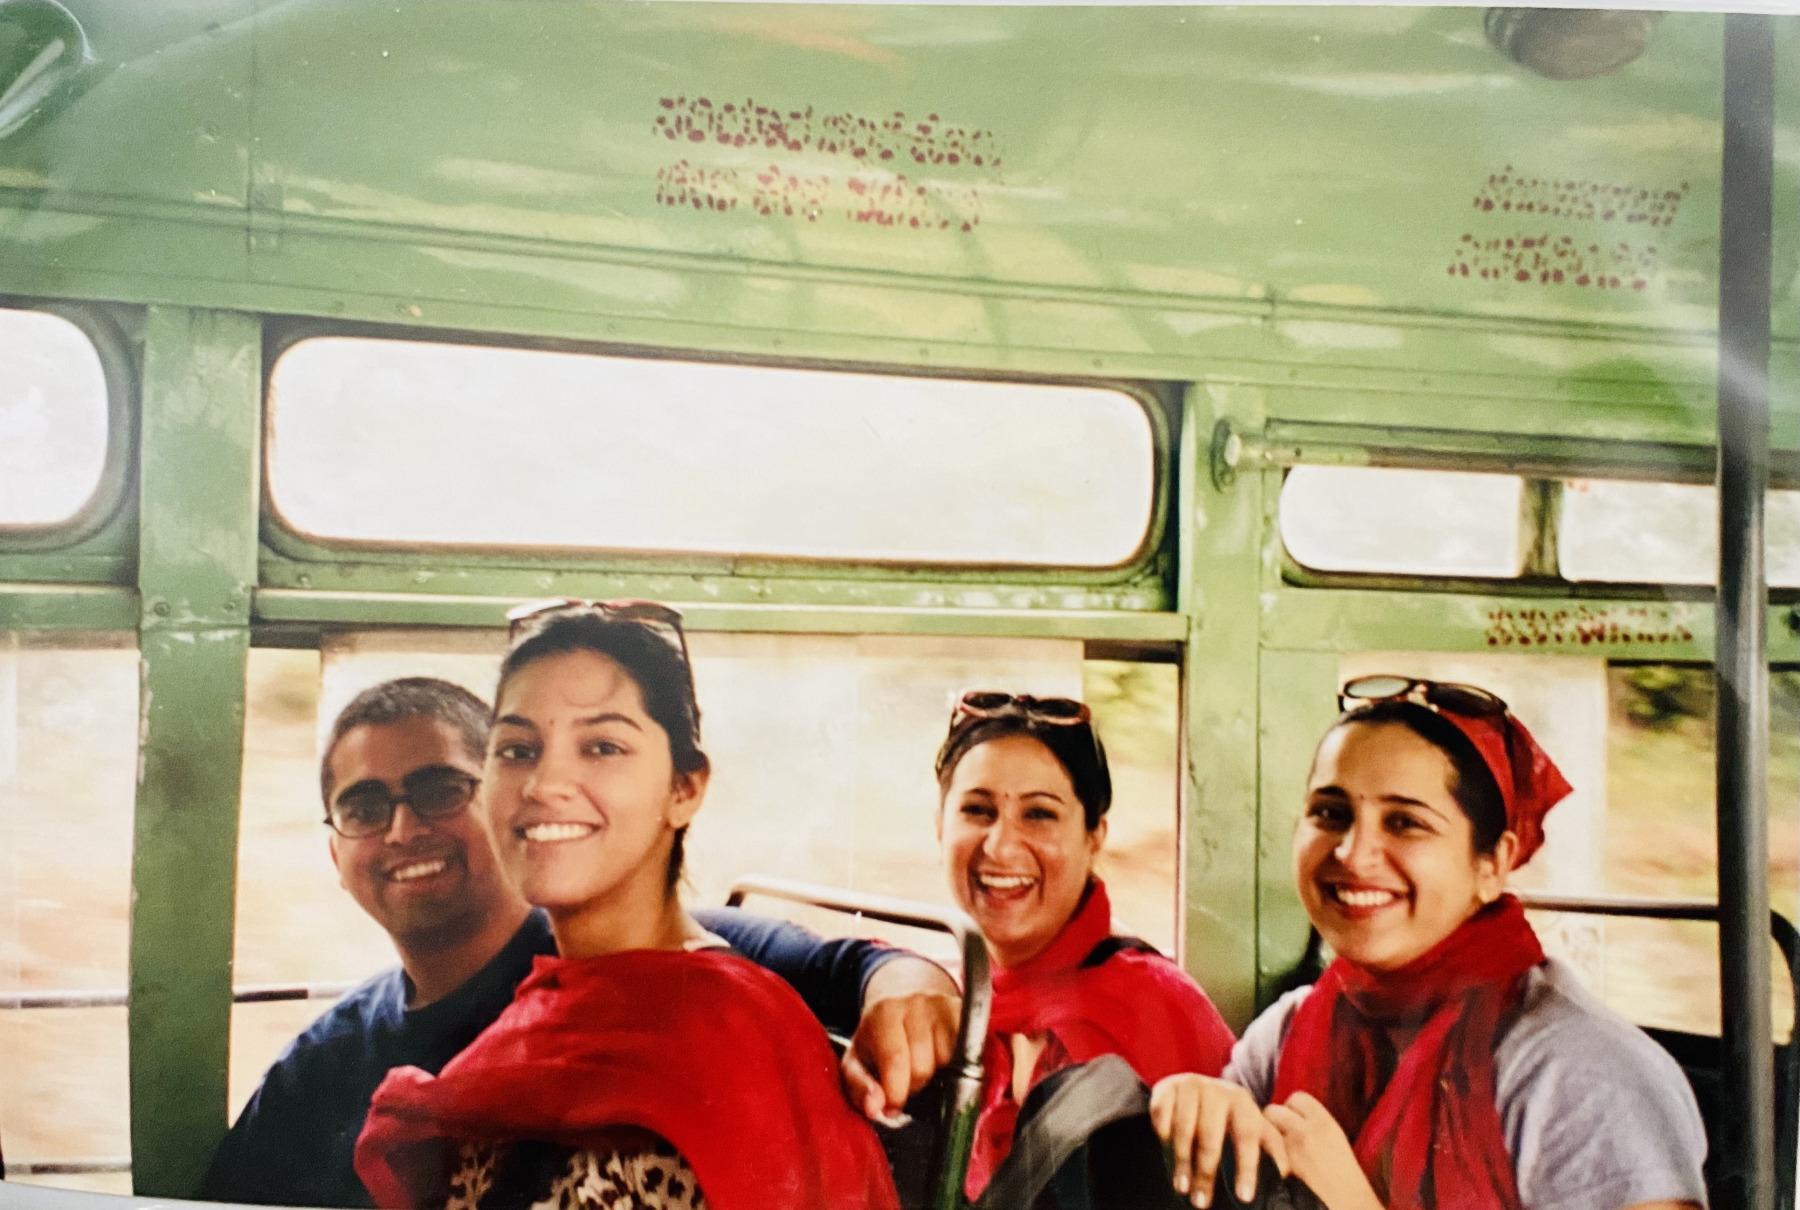 Tanvi, Vikas, Meenakshi and Manju riding on a local bus.